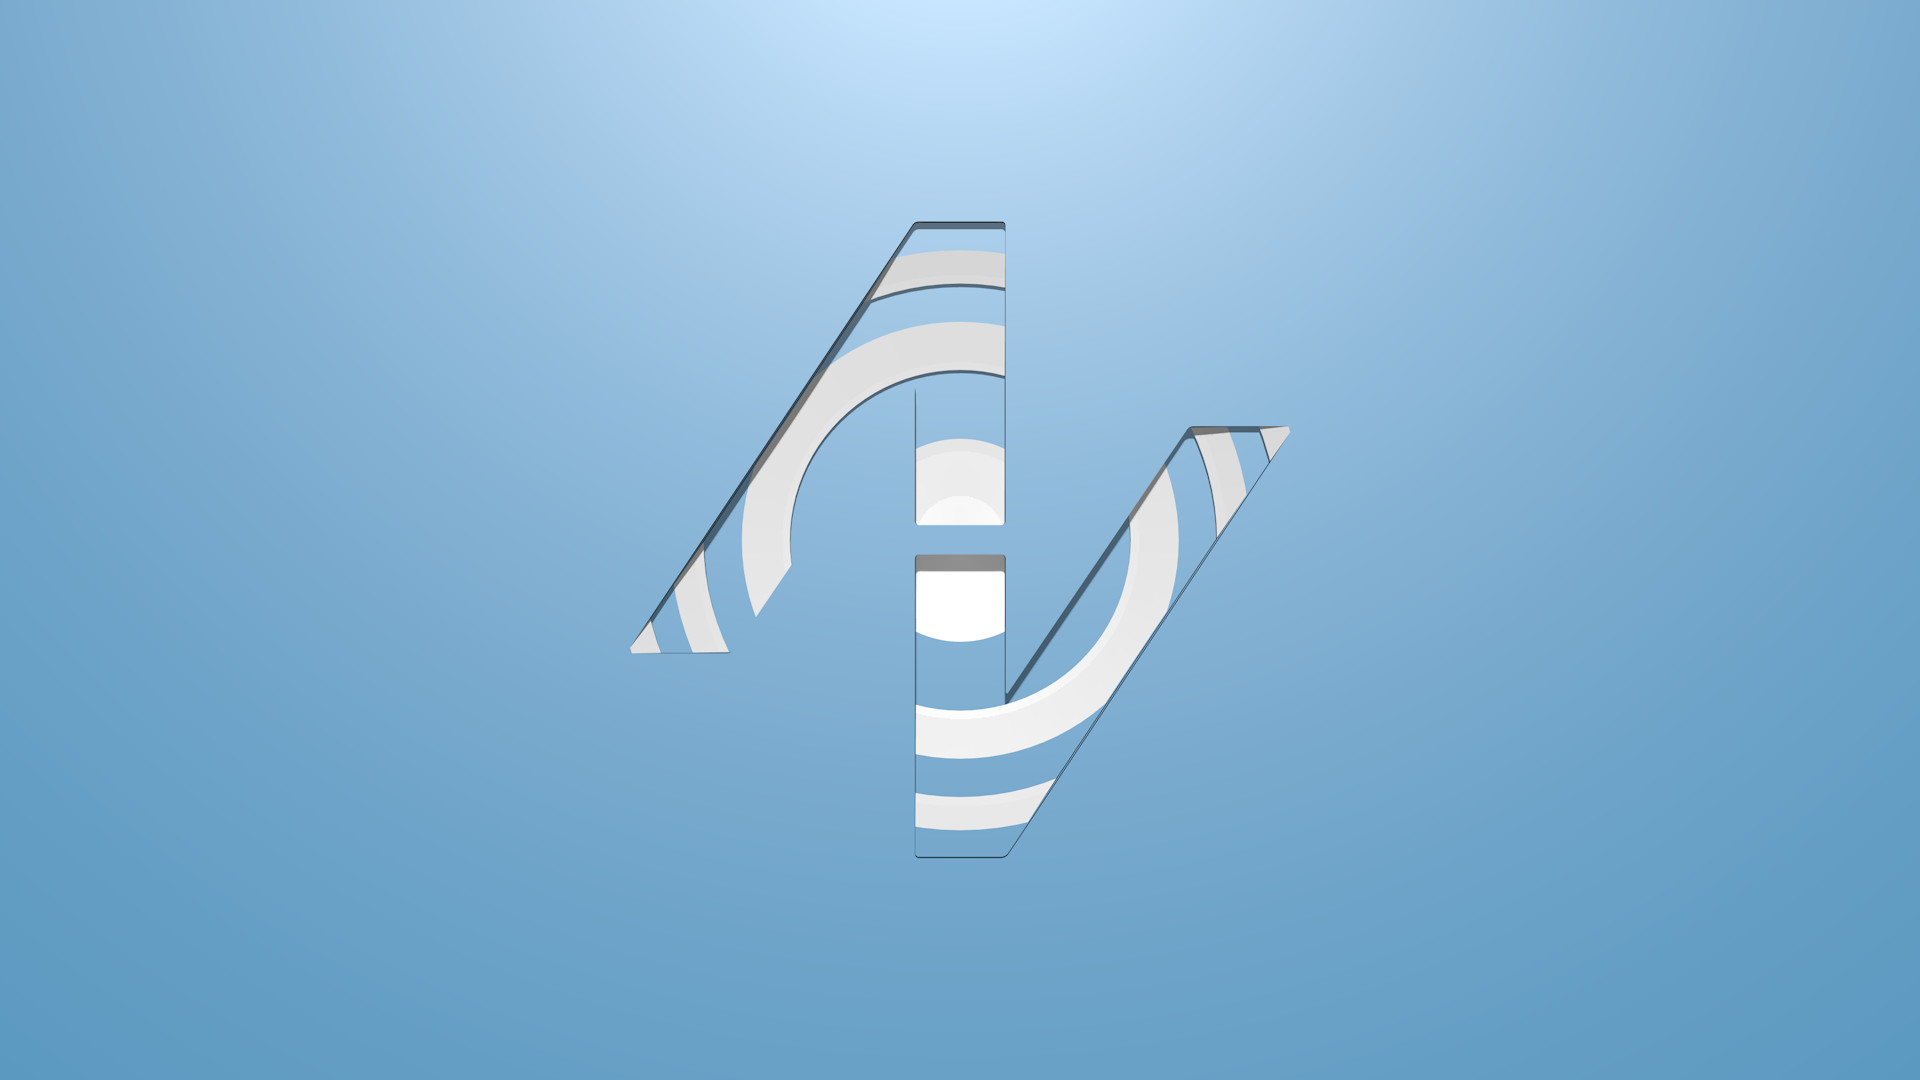 Nirvana Logo Wallpaper (50+ Images